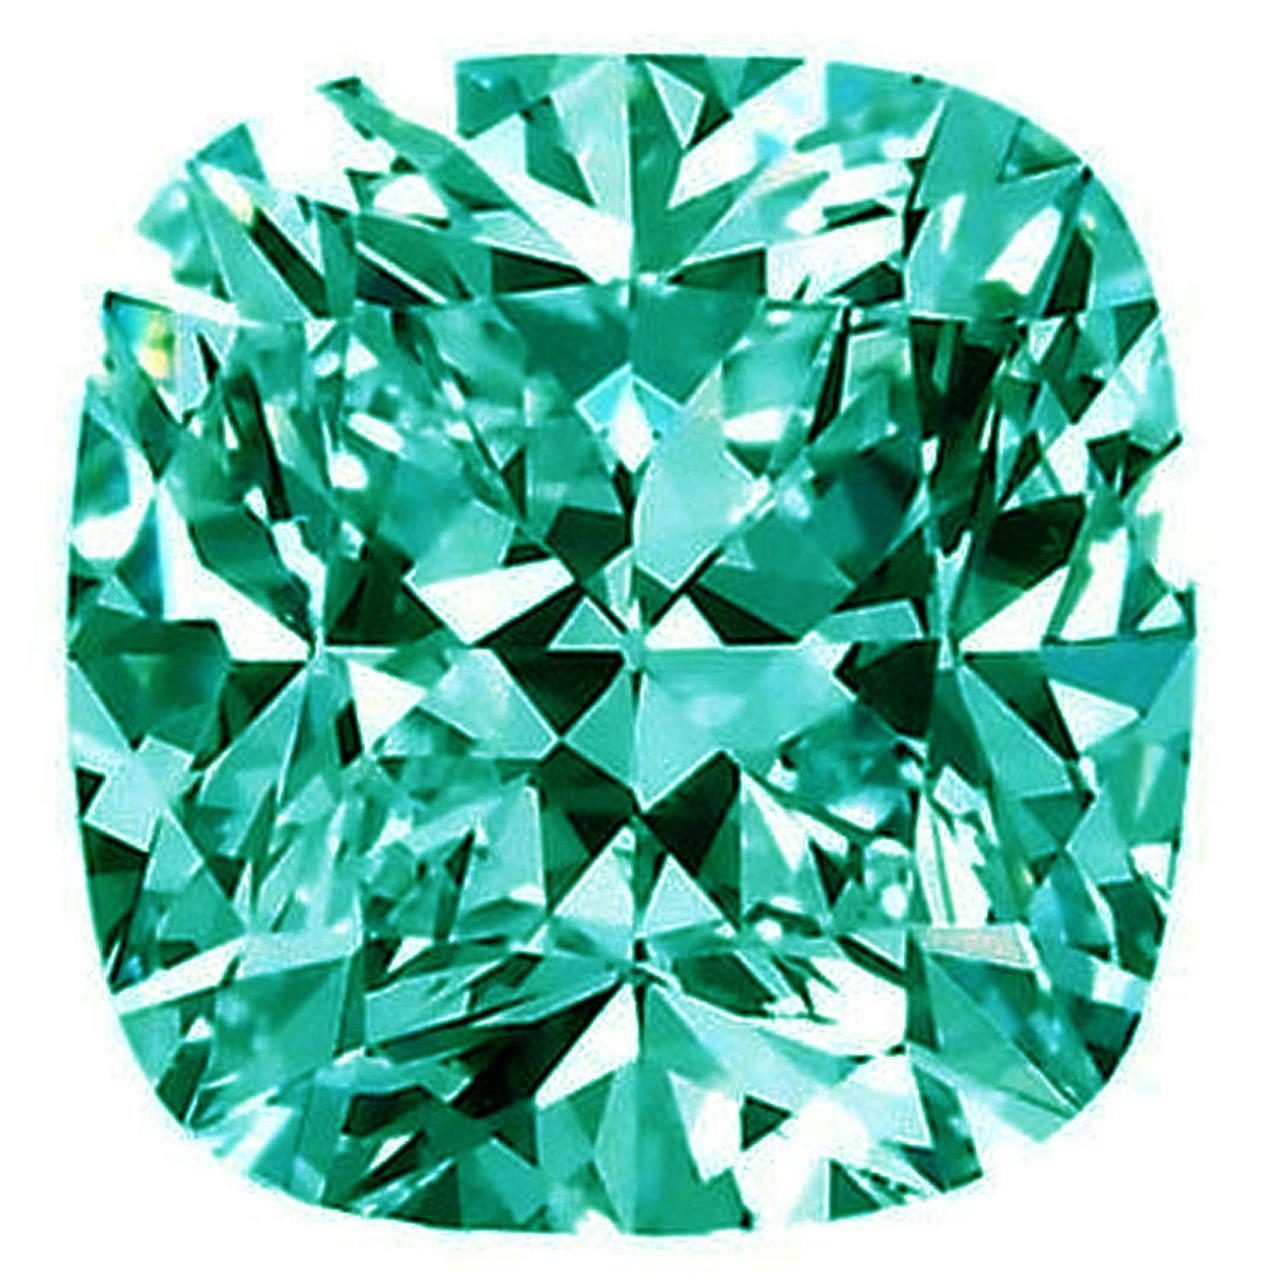 Бриллиант - Муассанит  8.33 ct VVS1